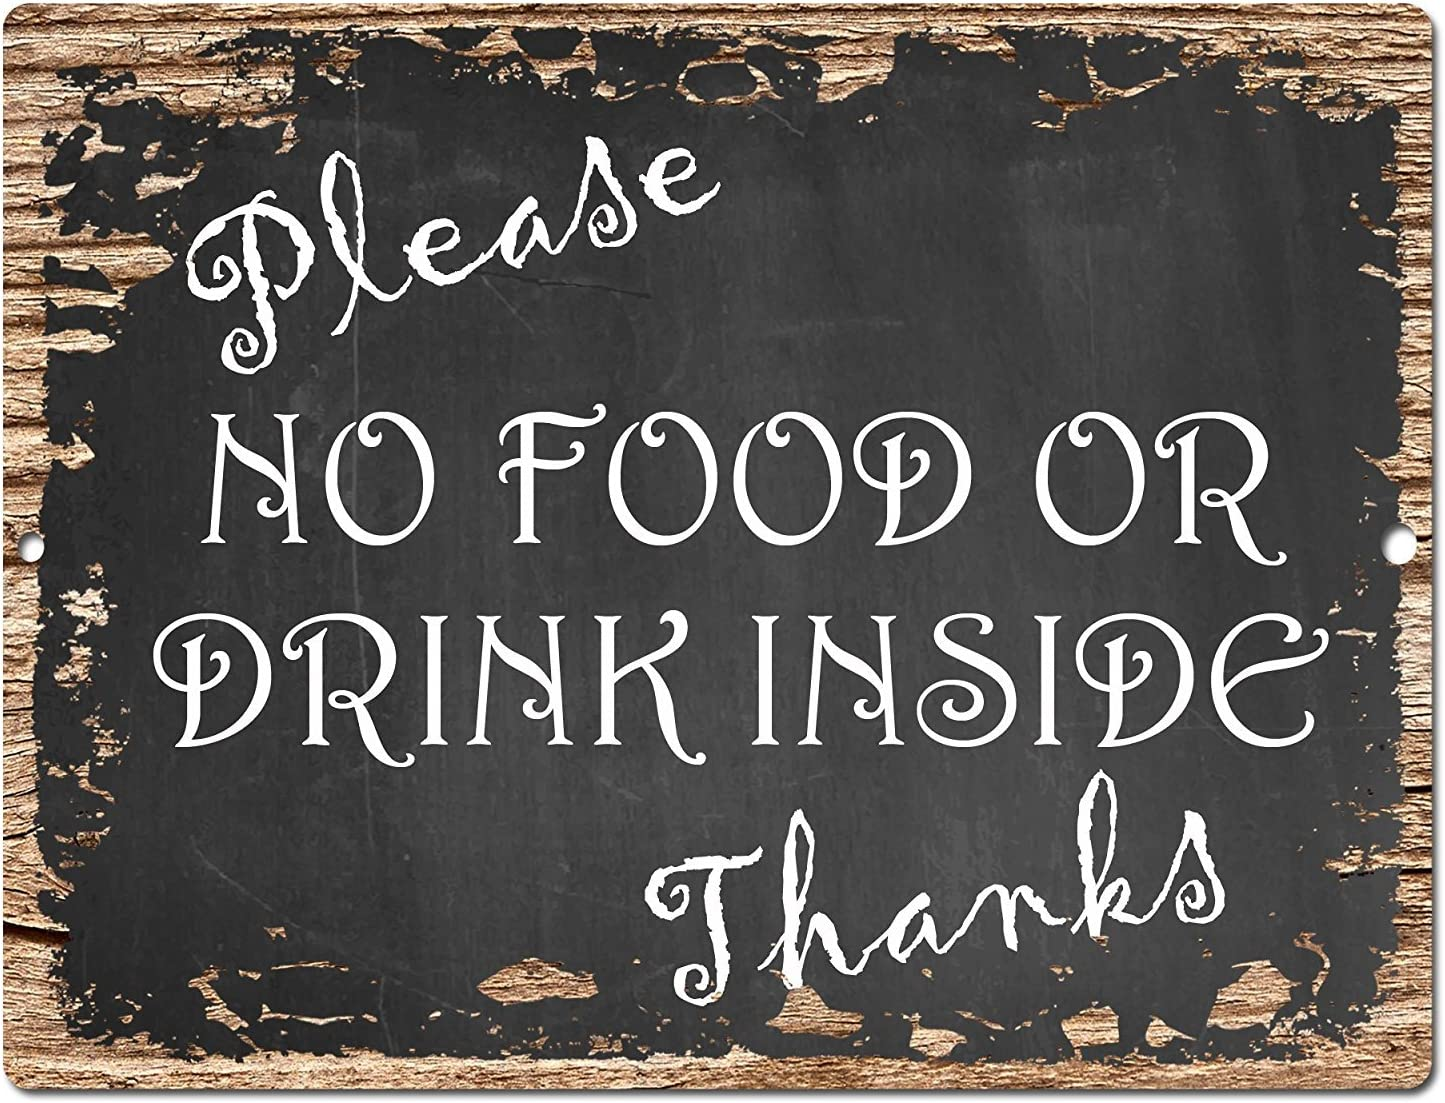 Please No Food Or Drink Sign Rustic Vintage Retro Kitchen Bar Pub Coffee Shop Wall Decor 9